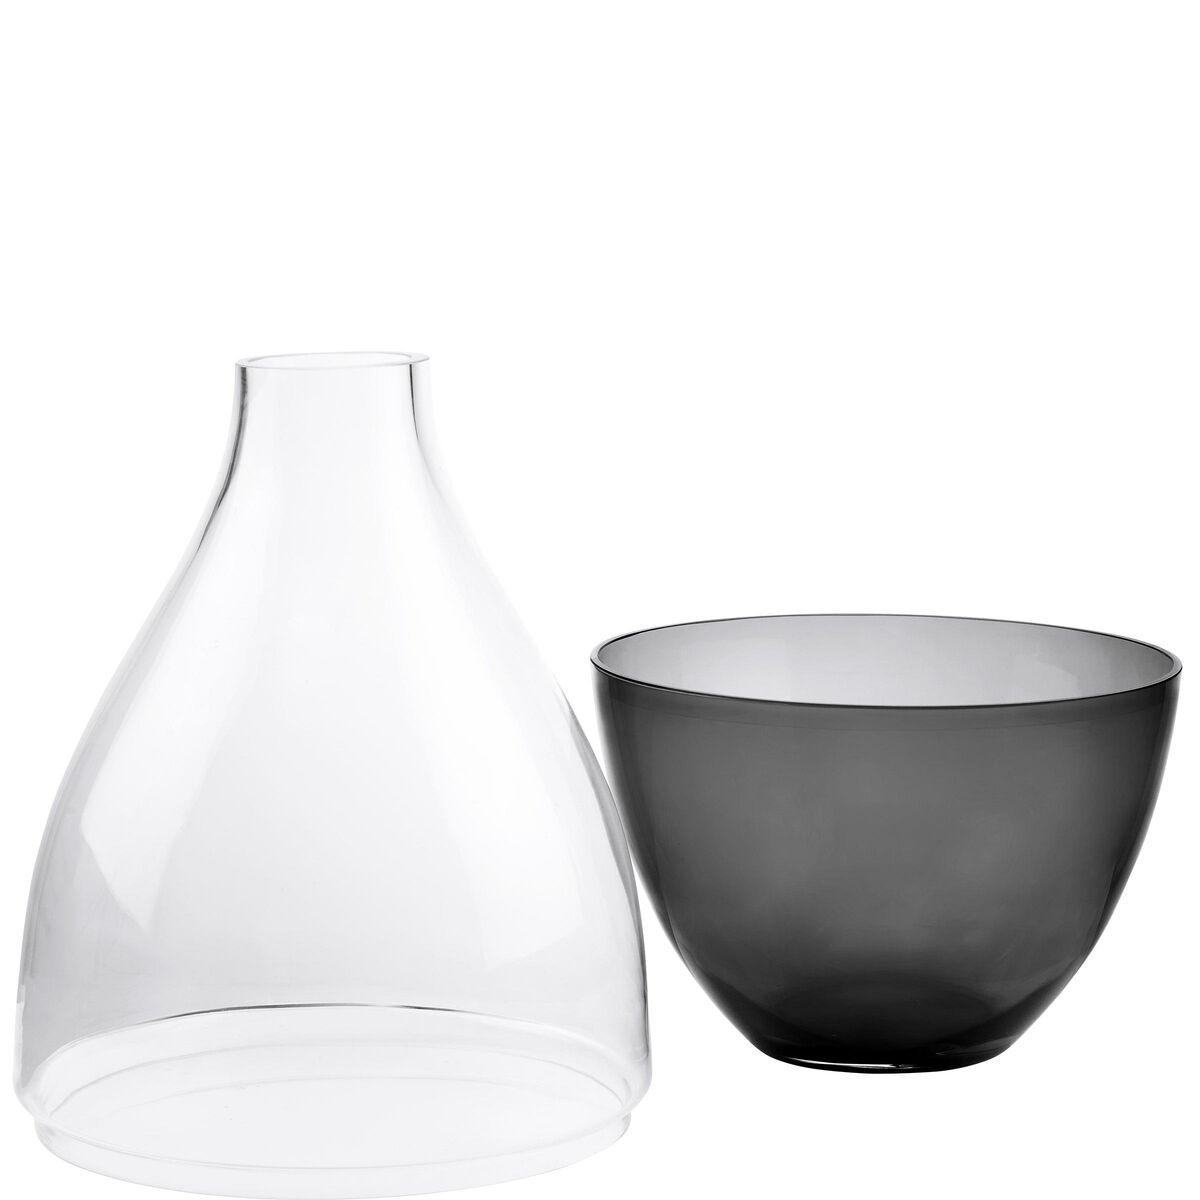 AMALIA Bodenvase Glas 2-teilig L55cm